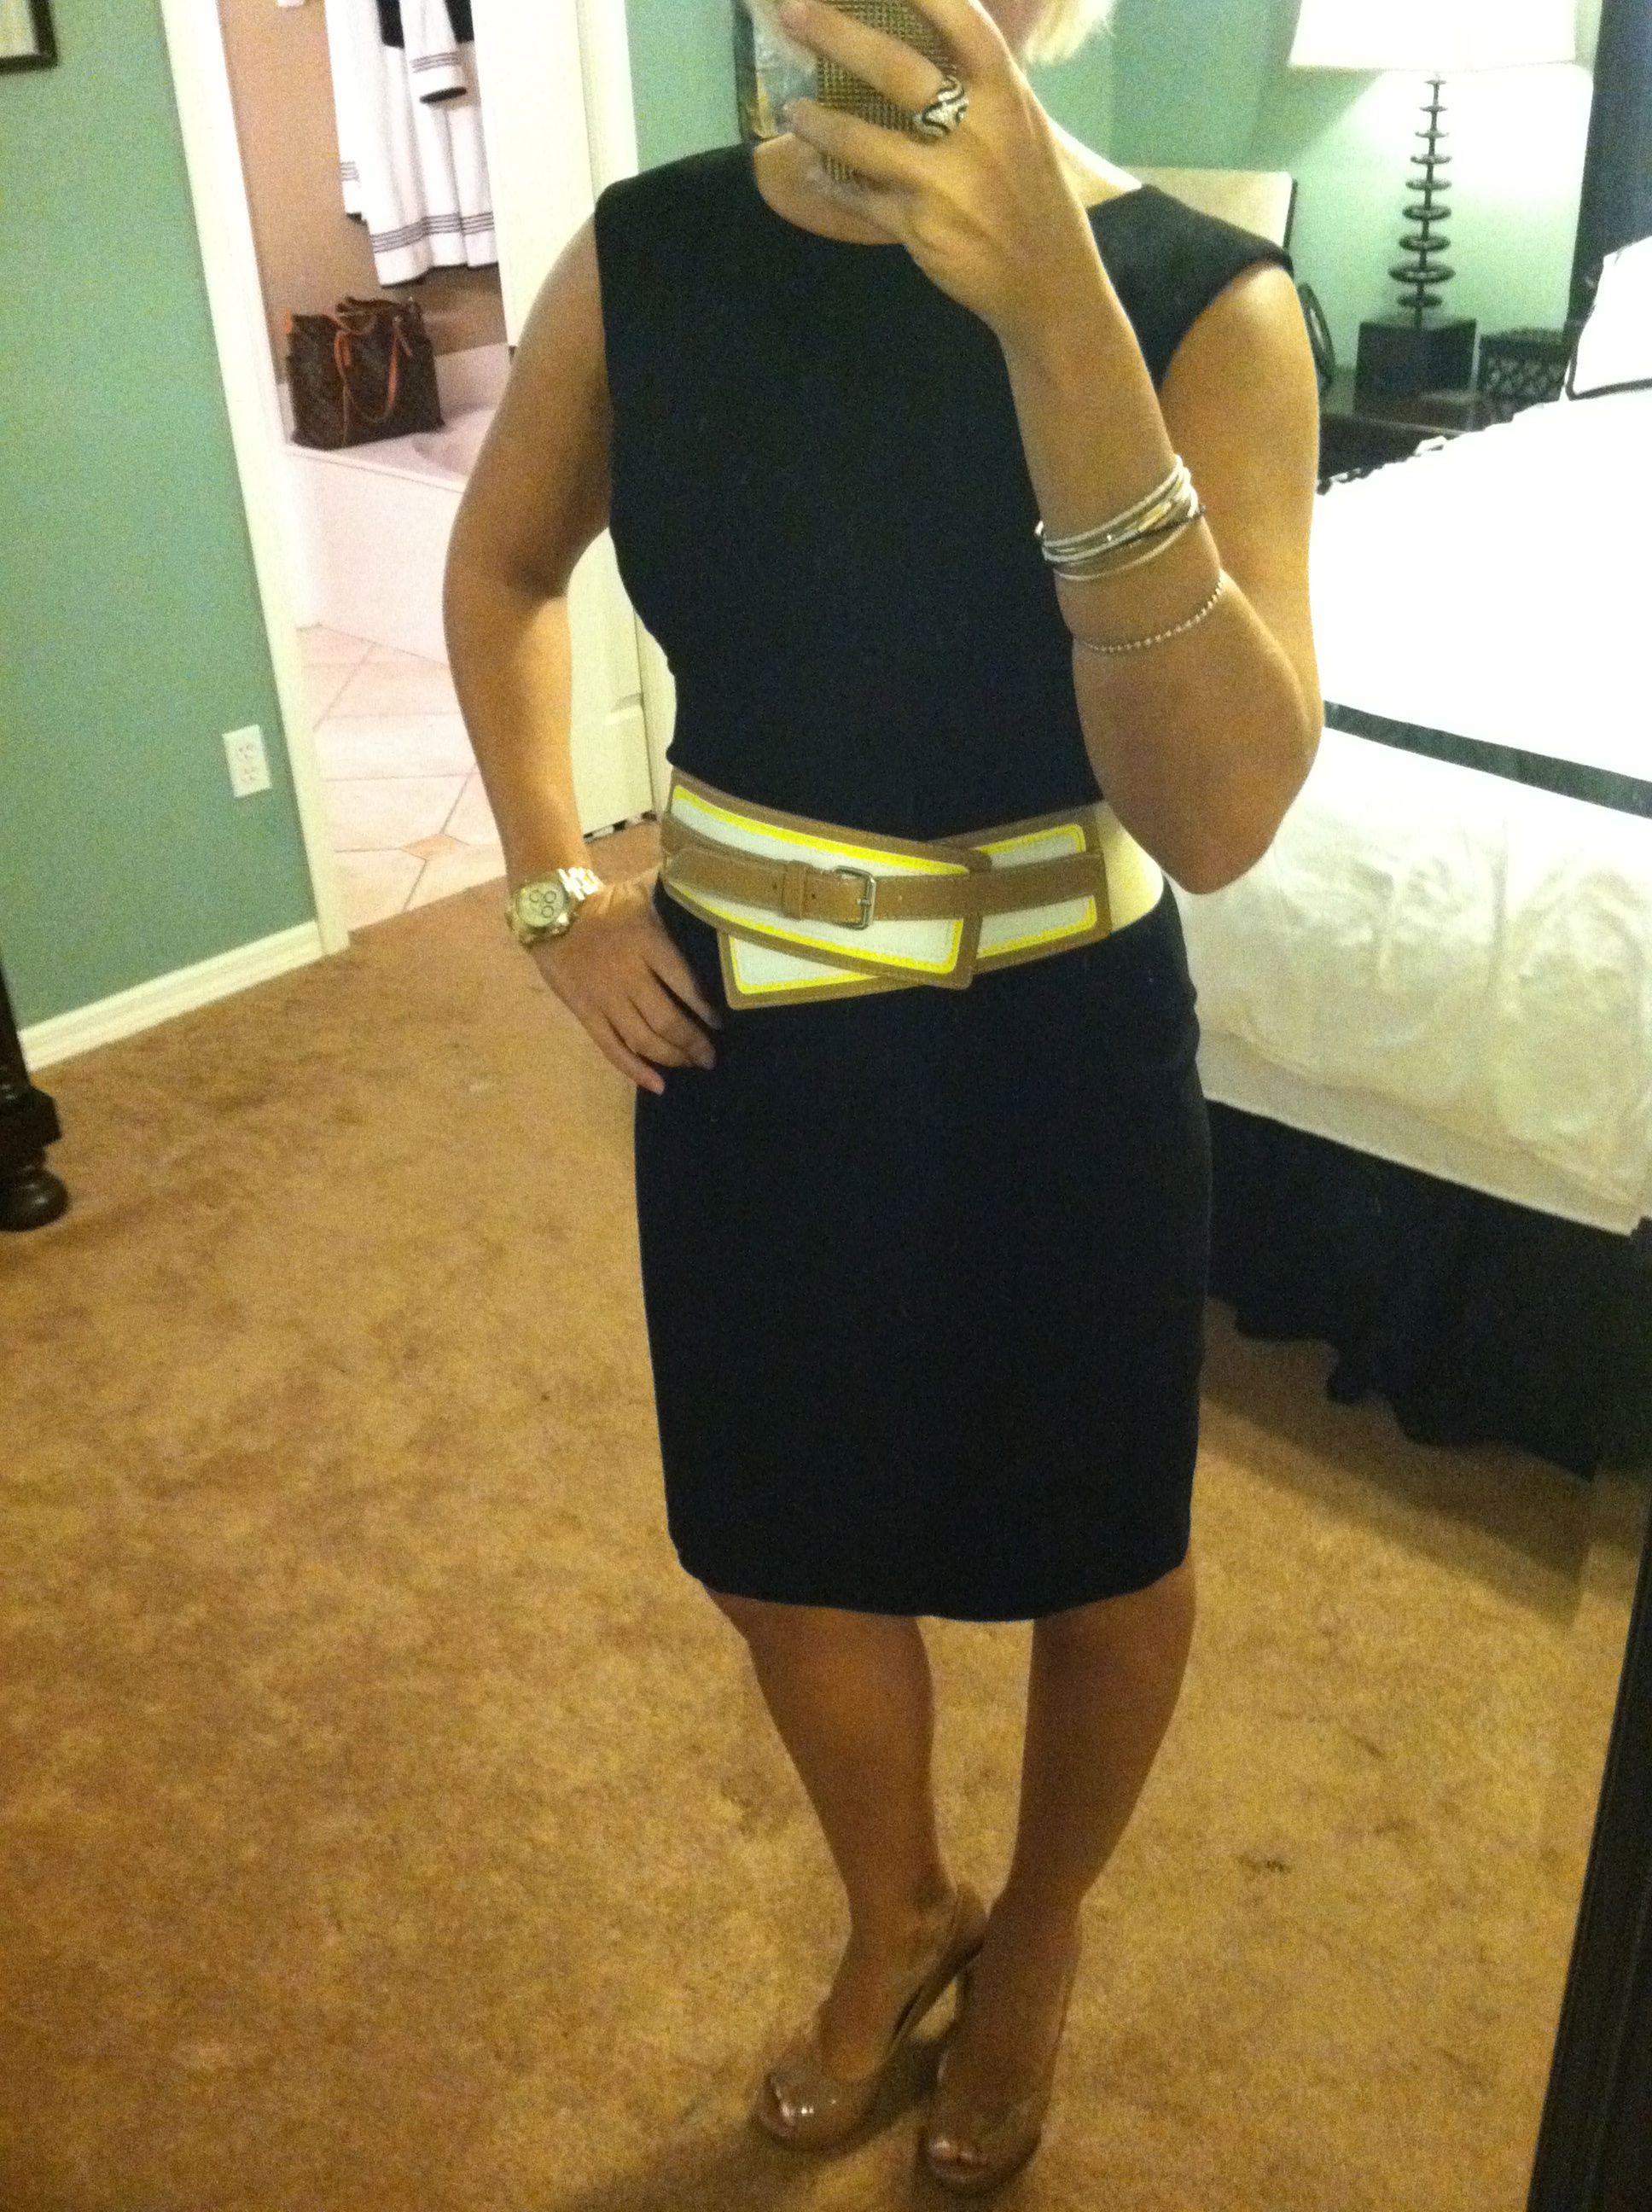 0edbf9db1cd1b Dress - Calvin Klein Belt - TJ Maxx Shoes - Vince Camuto - Dillards Watch -  Invicta Mens